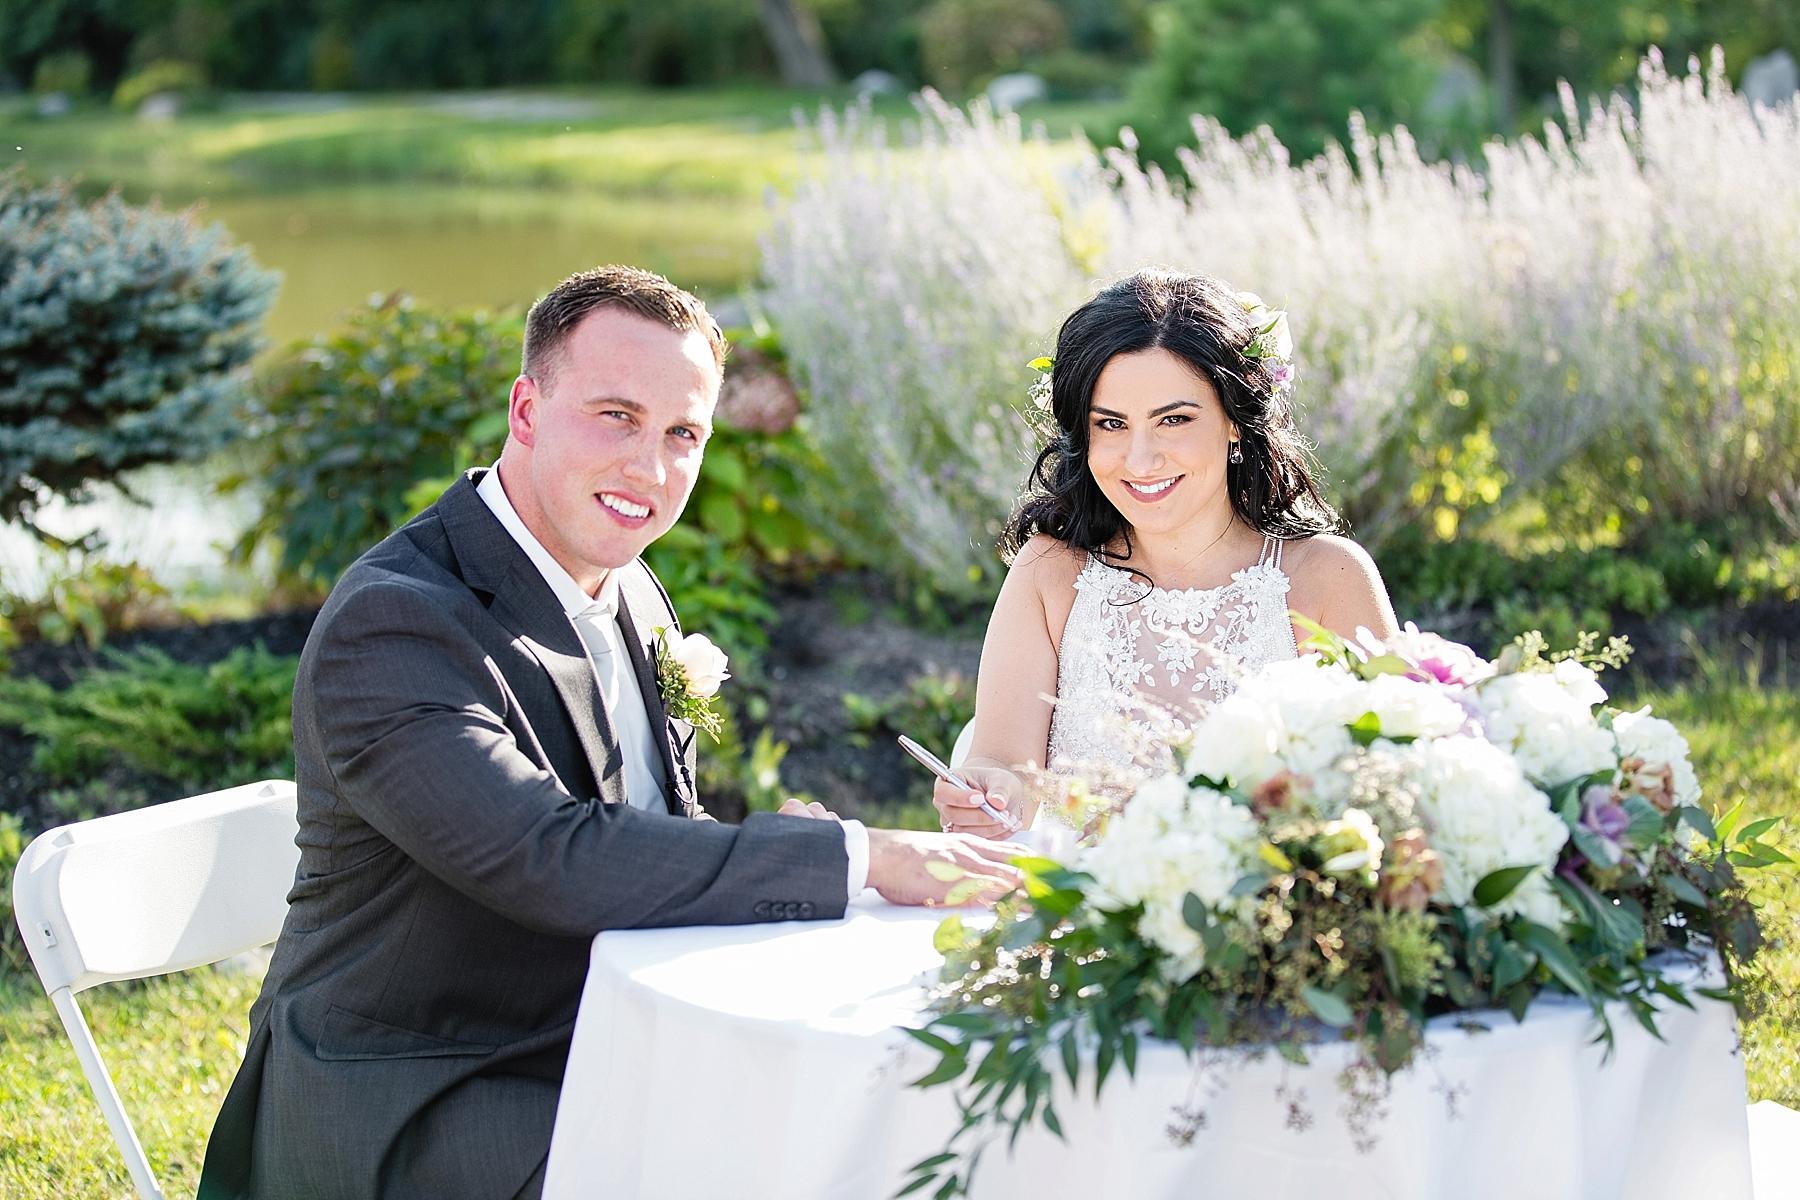 windsor-wedding-photographer-sprucewood-shores-winery-wedding-niagara-on-the-lake-wedding-photographer-eryn-shea-photography_0055.jpg